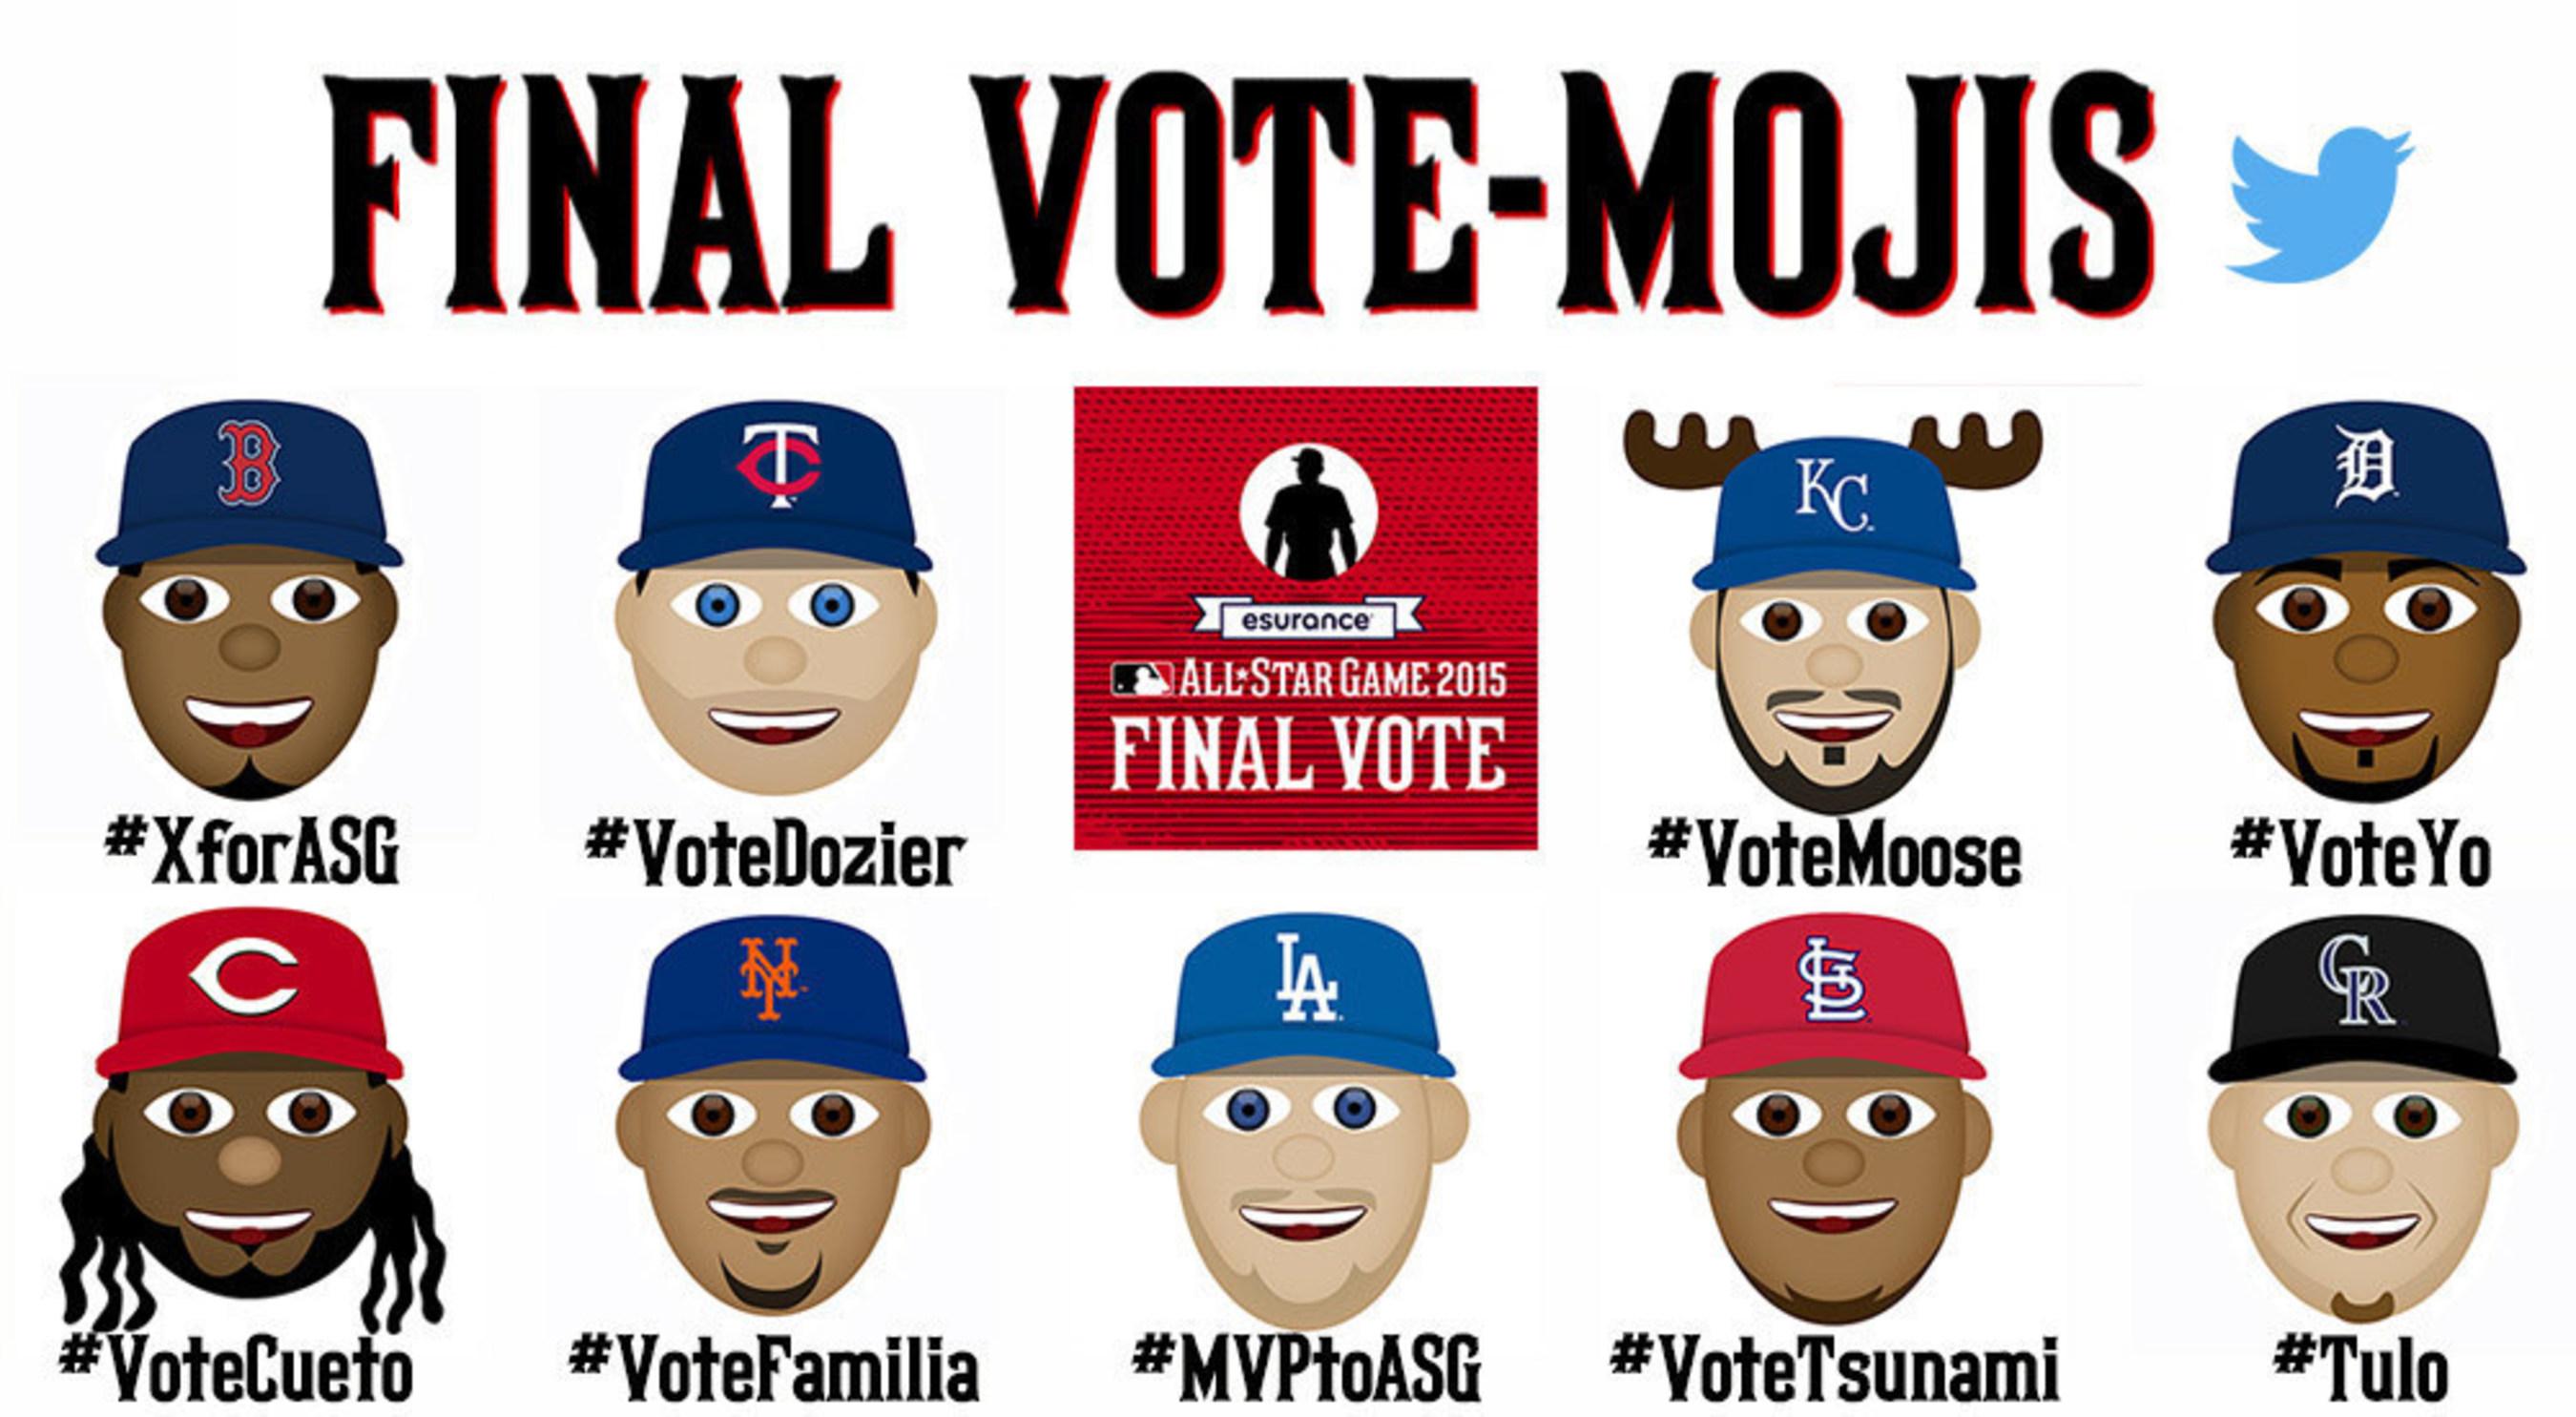 Final Vote-Mojis for 2015 Esurance MLB All-Star Game